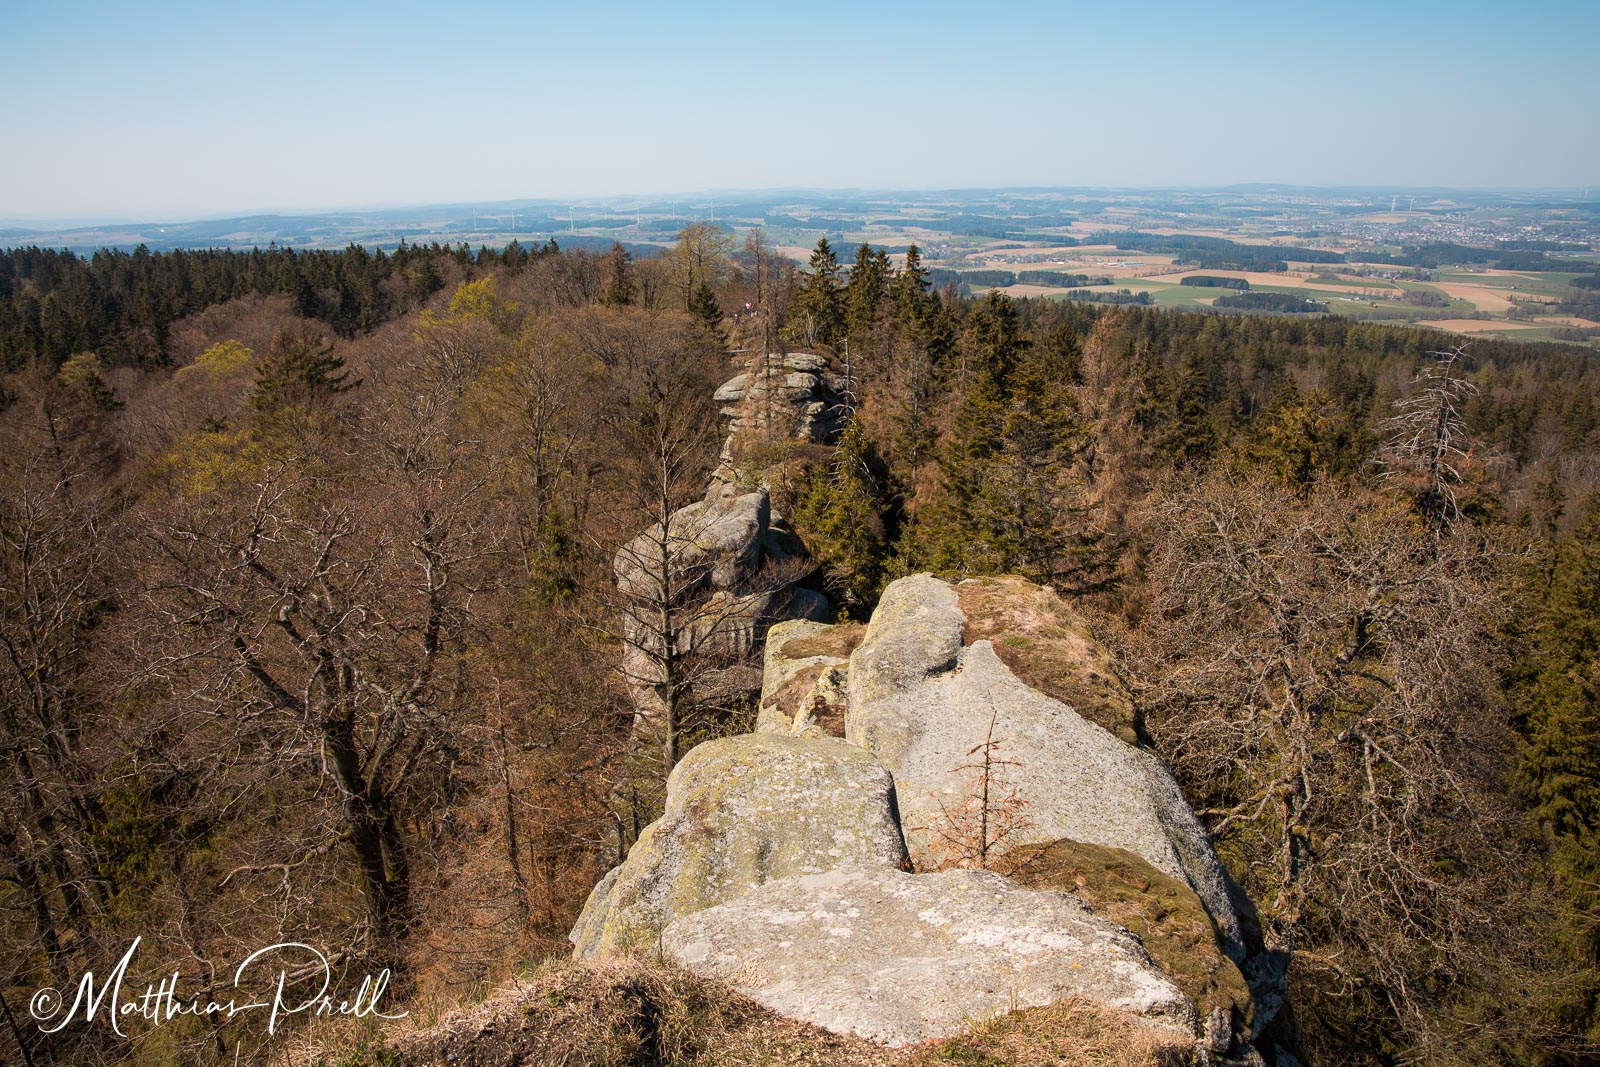 Großer Waldstein, Germany